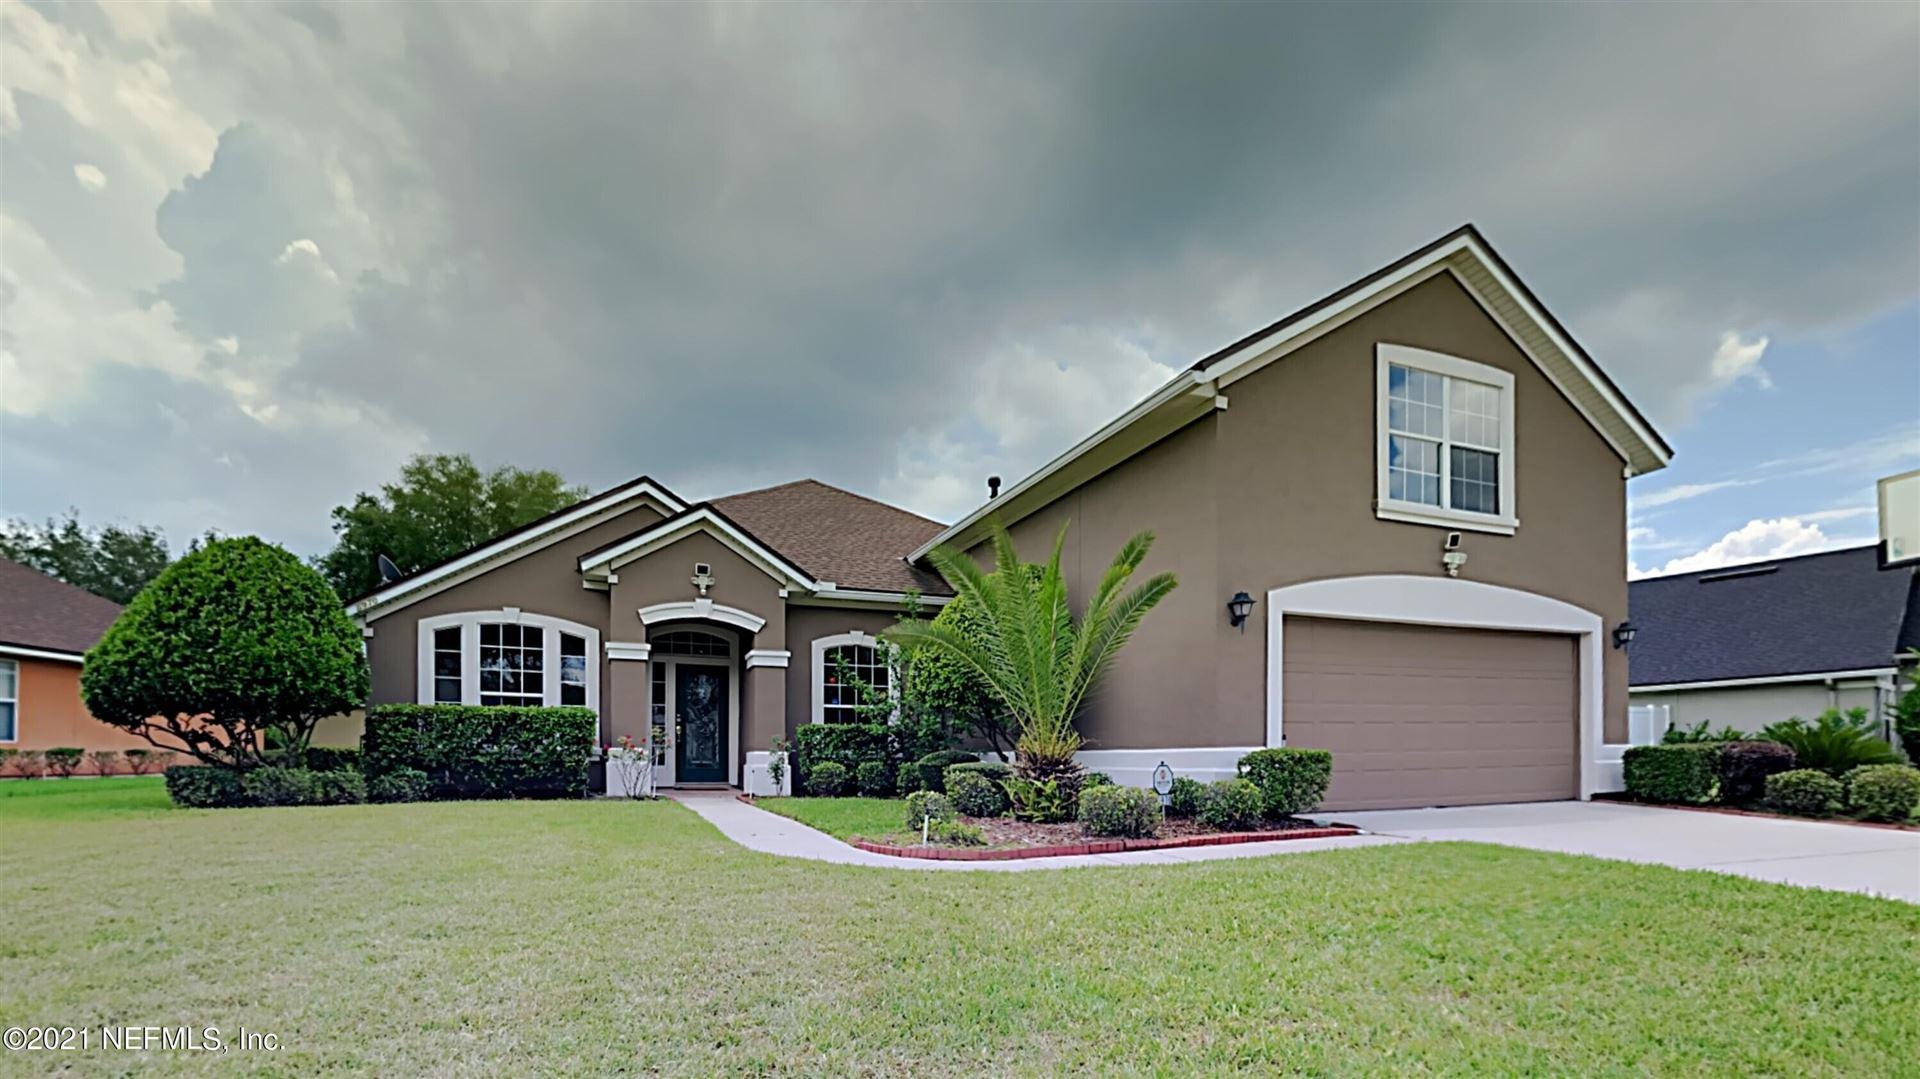 5970 GREEN POND DR, Jacksonville, FL 32258 - MLS#: 1122607